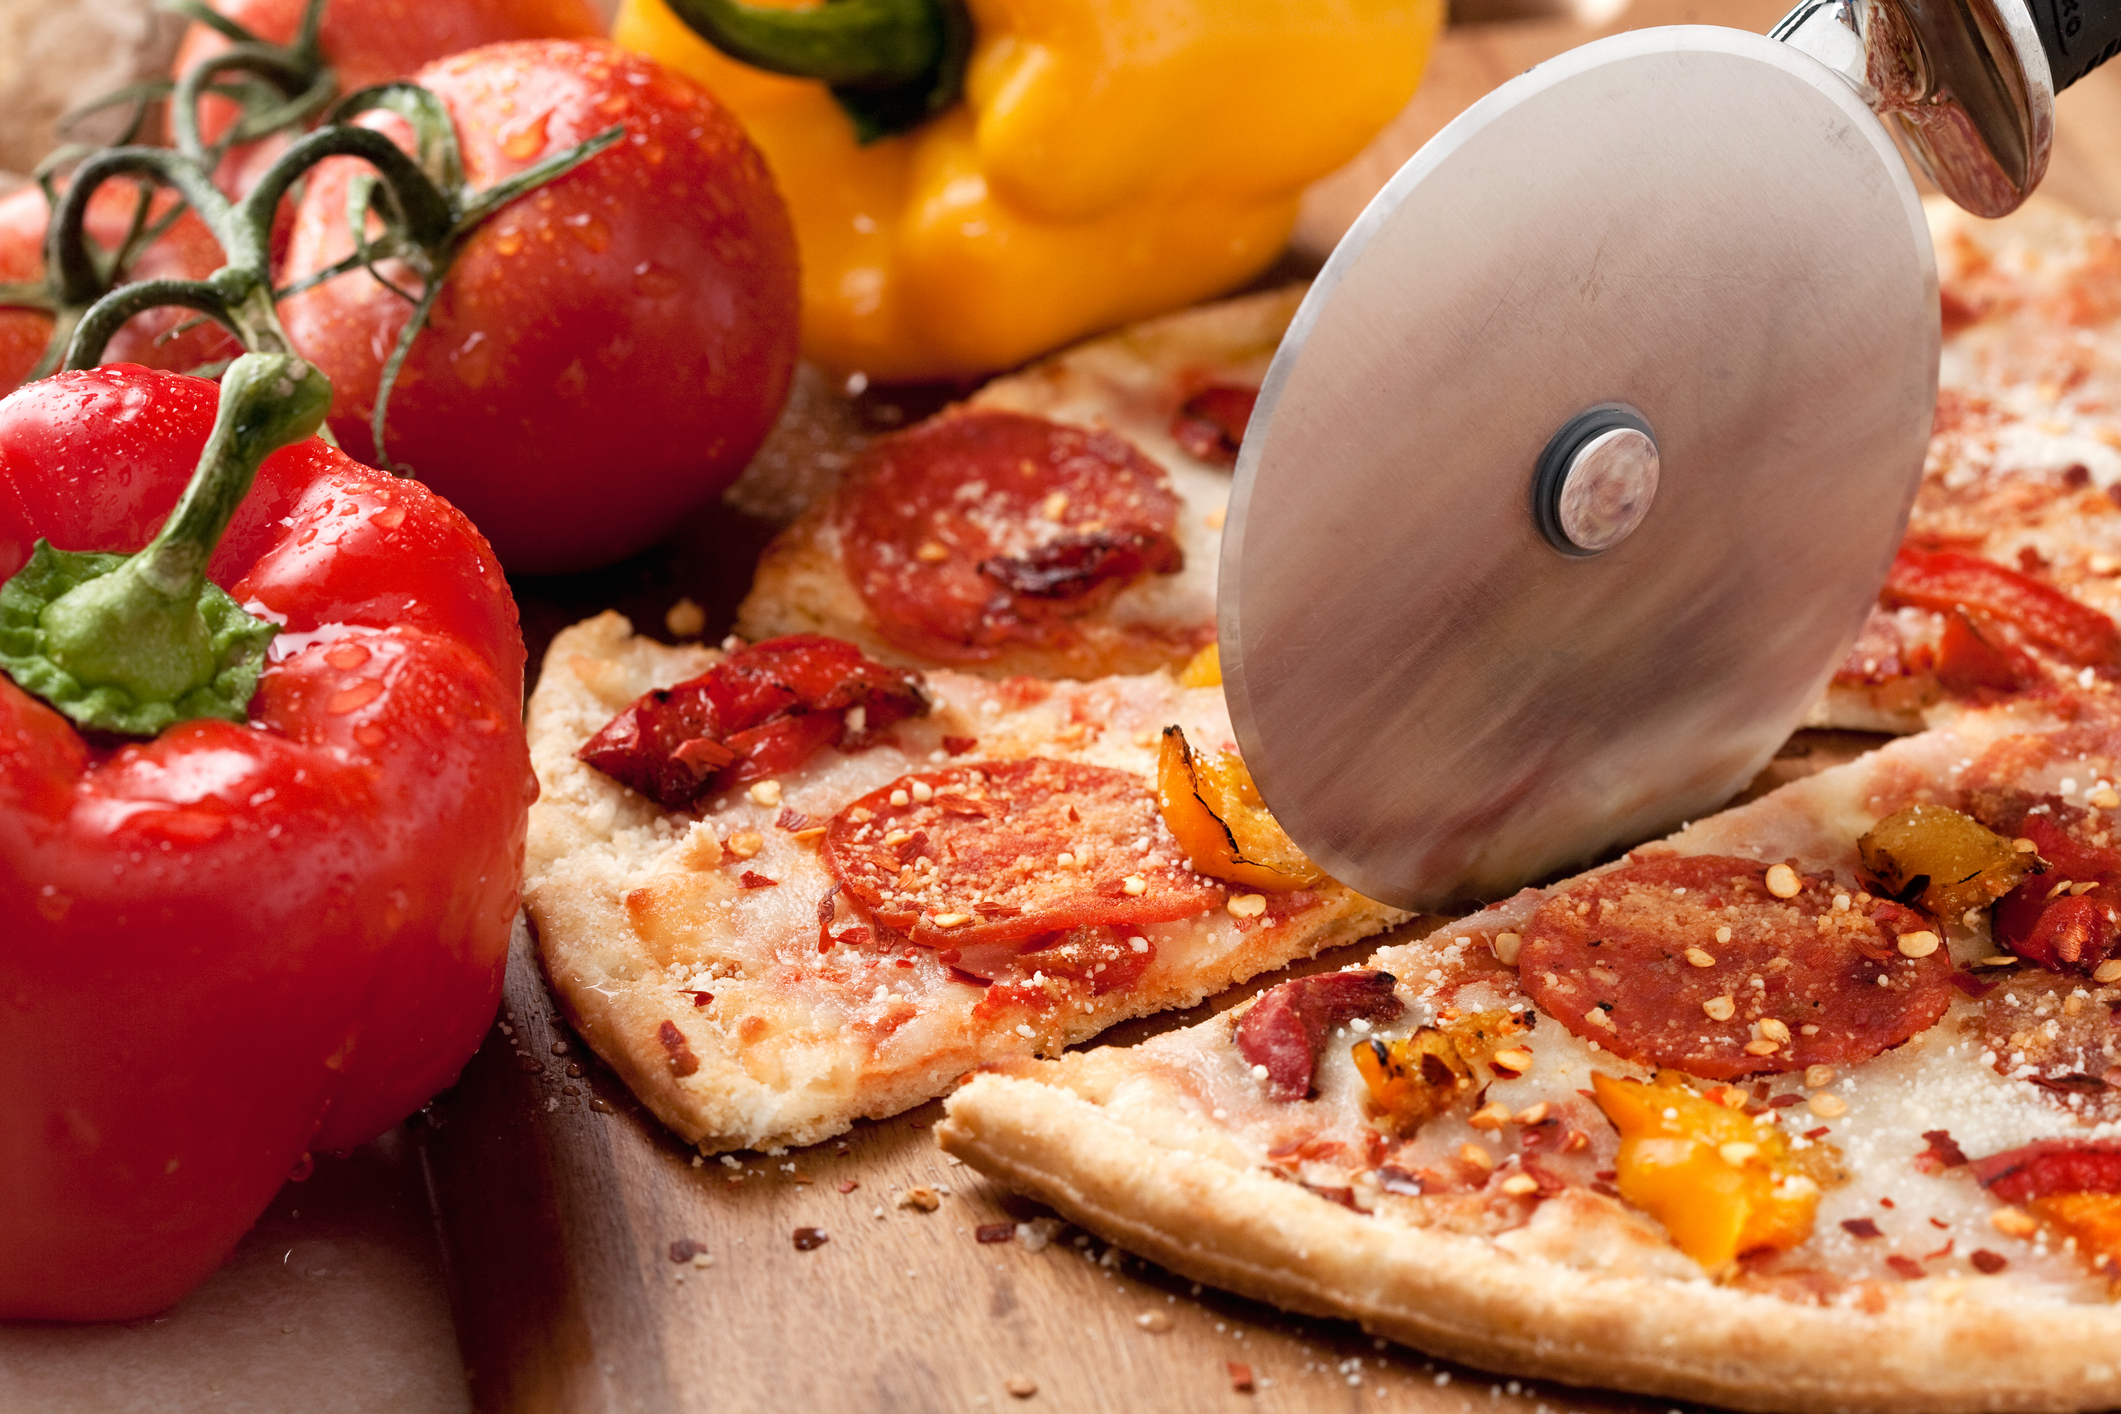 Making Pizza At Home Recipes